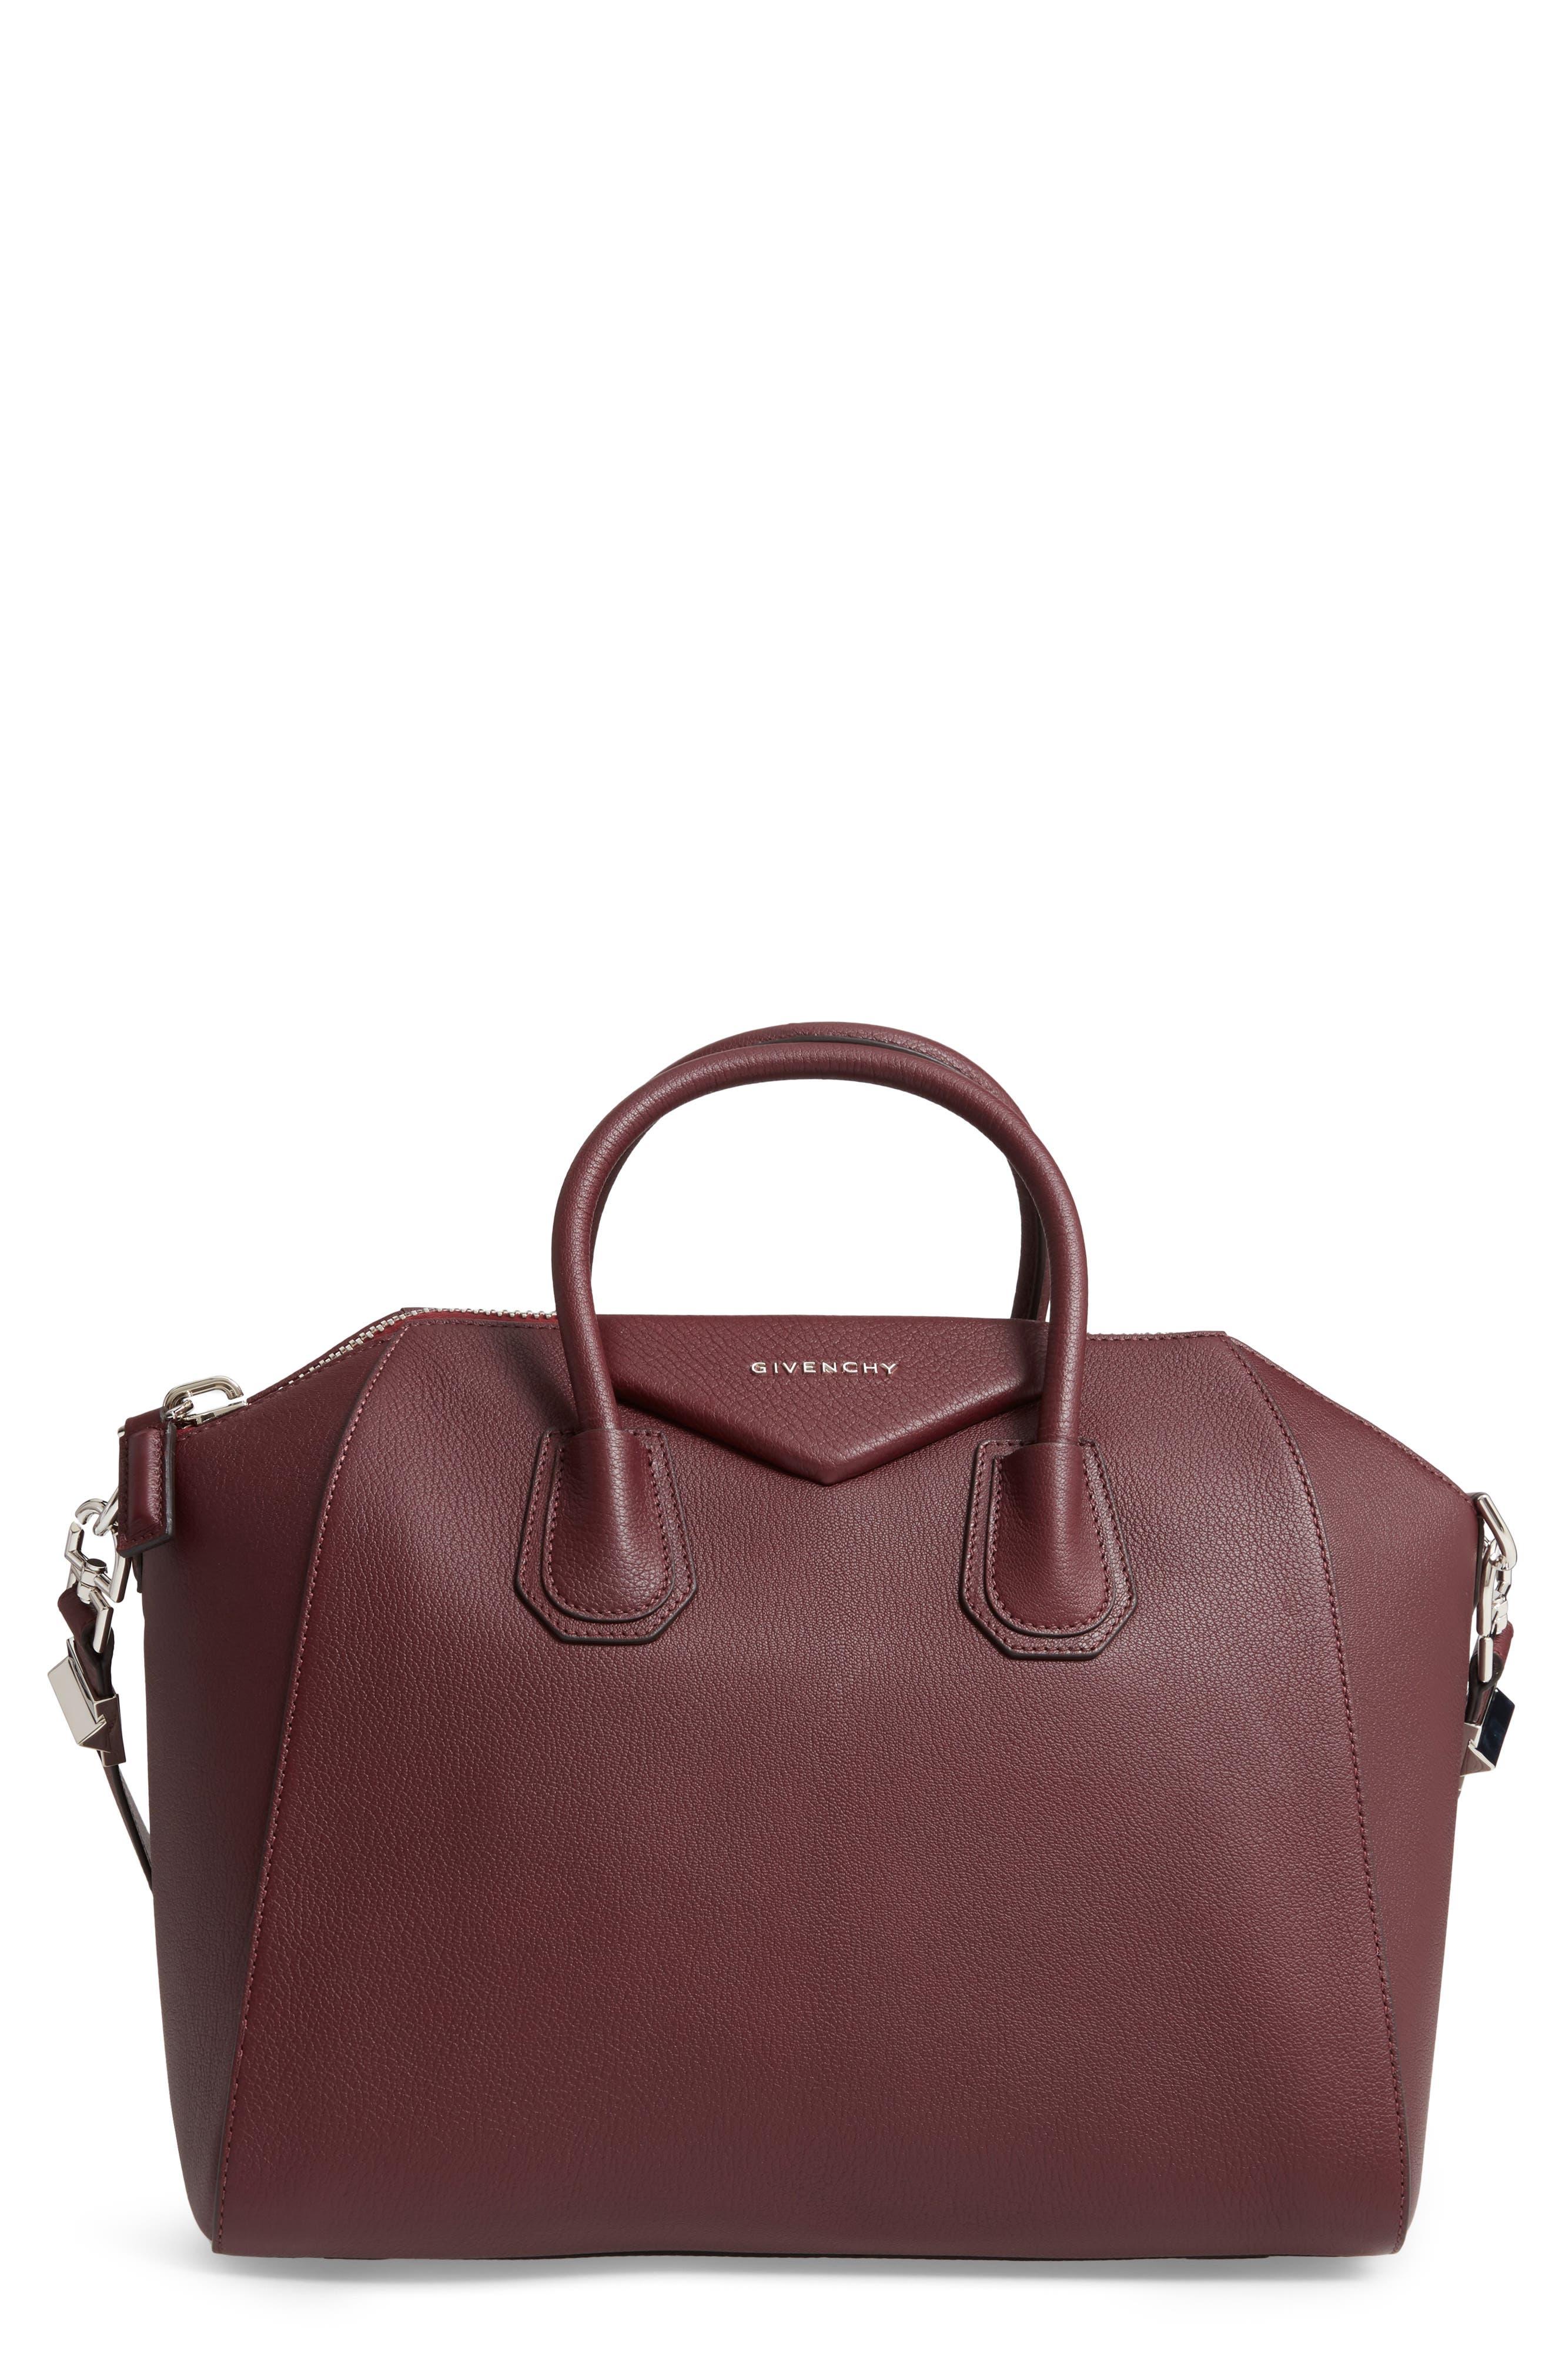 Givenchy Medium Antigona Sugar Leather Satchel | Nordstrom